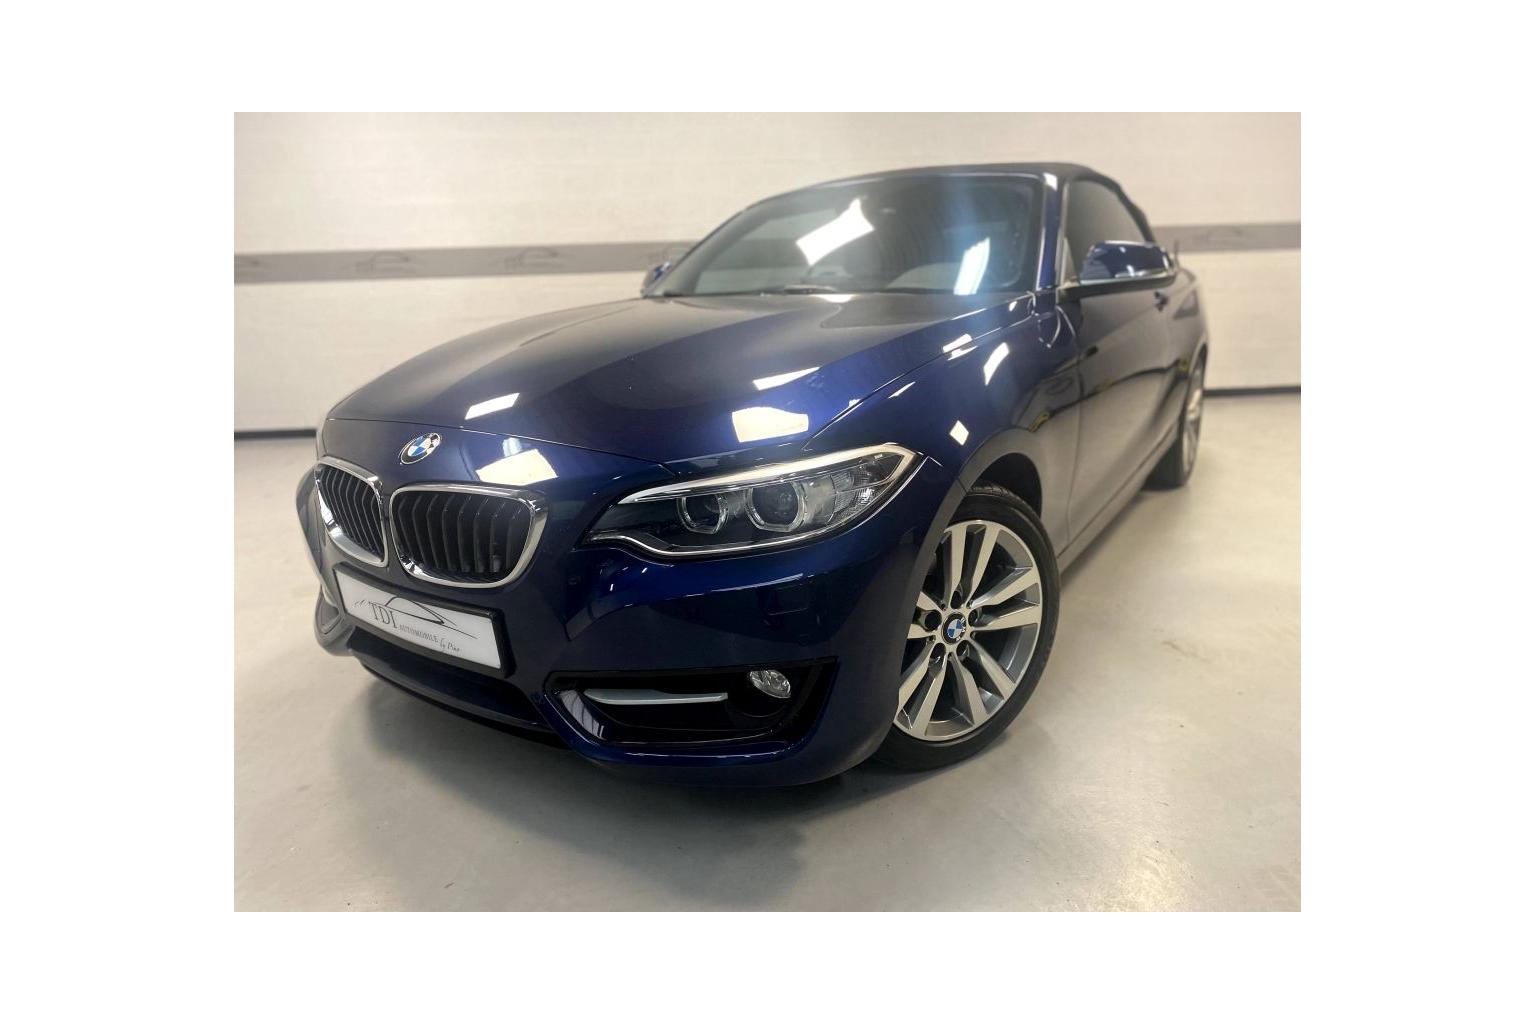 BMW 218d Cabriolet 2016